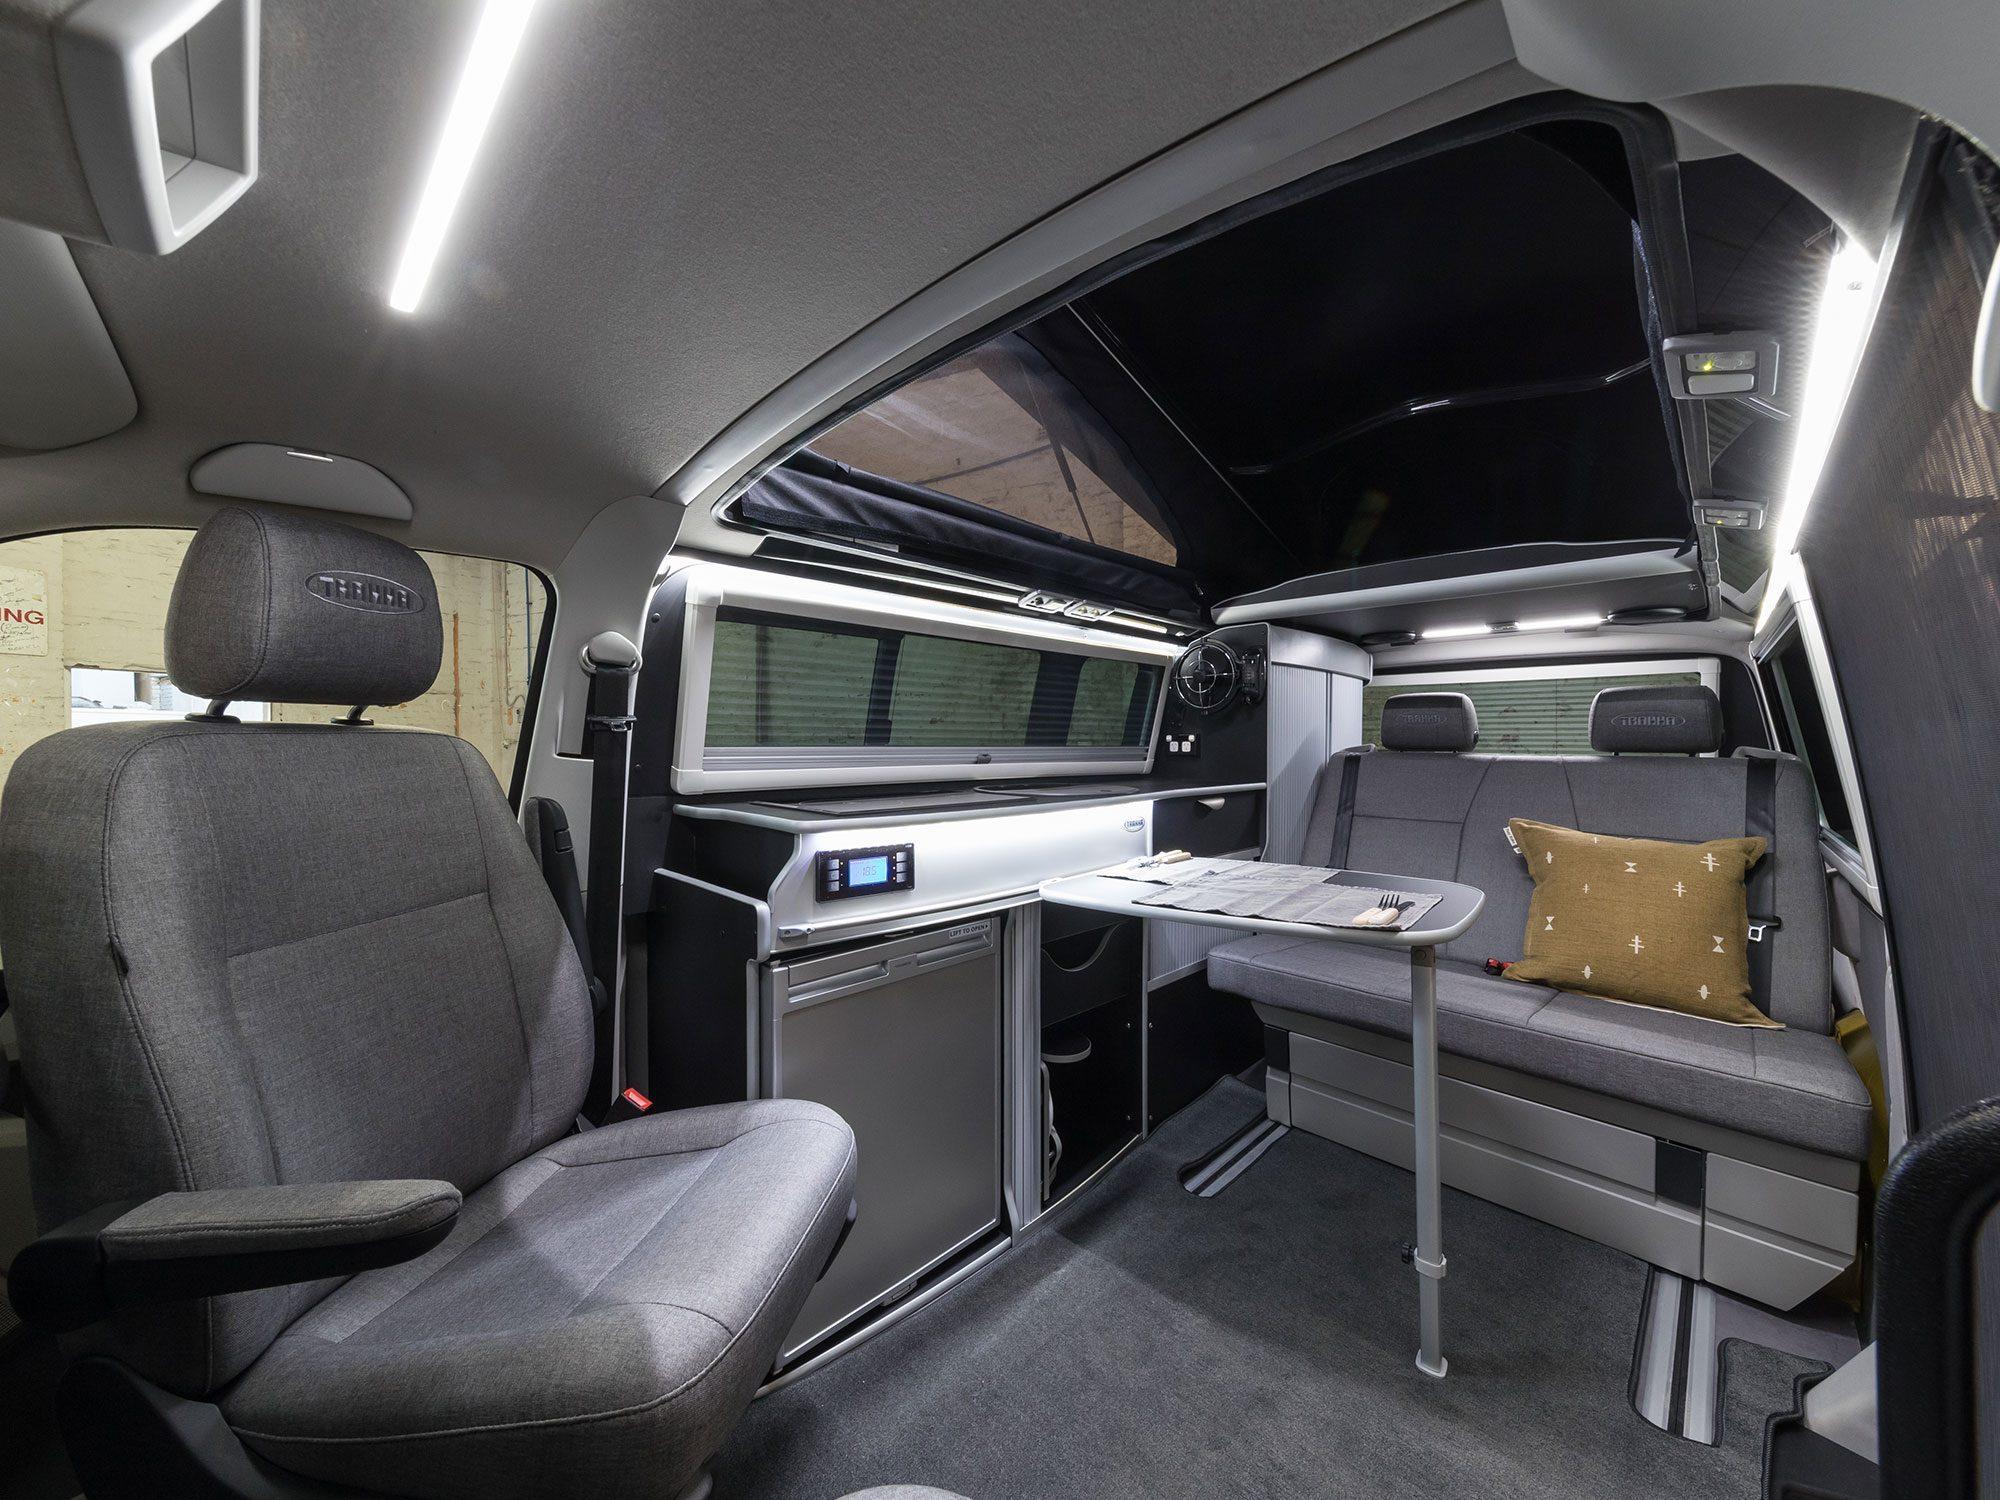 vw-t6-trakkadu-450-interior3